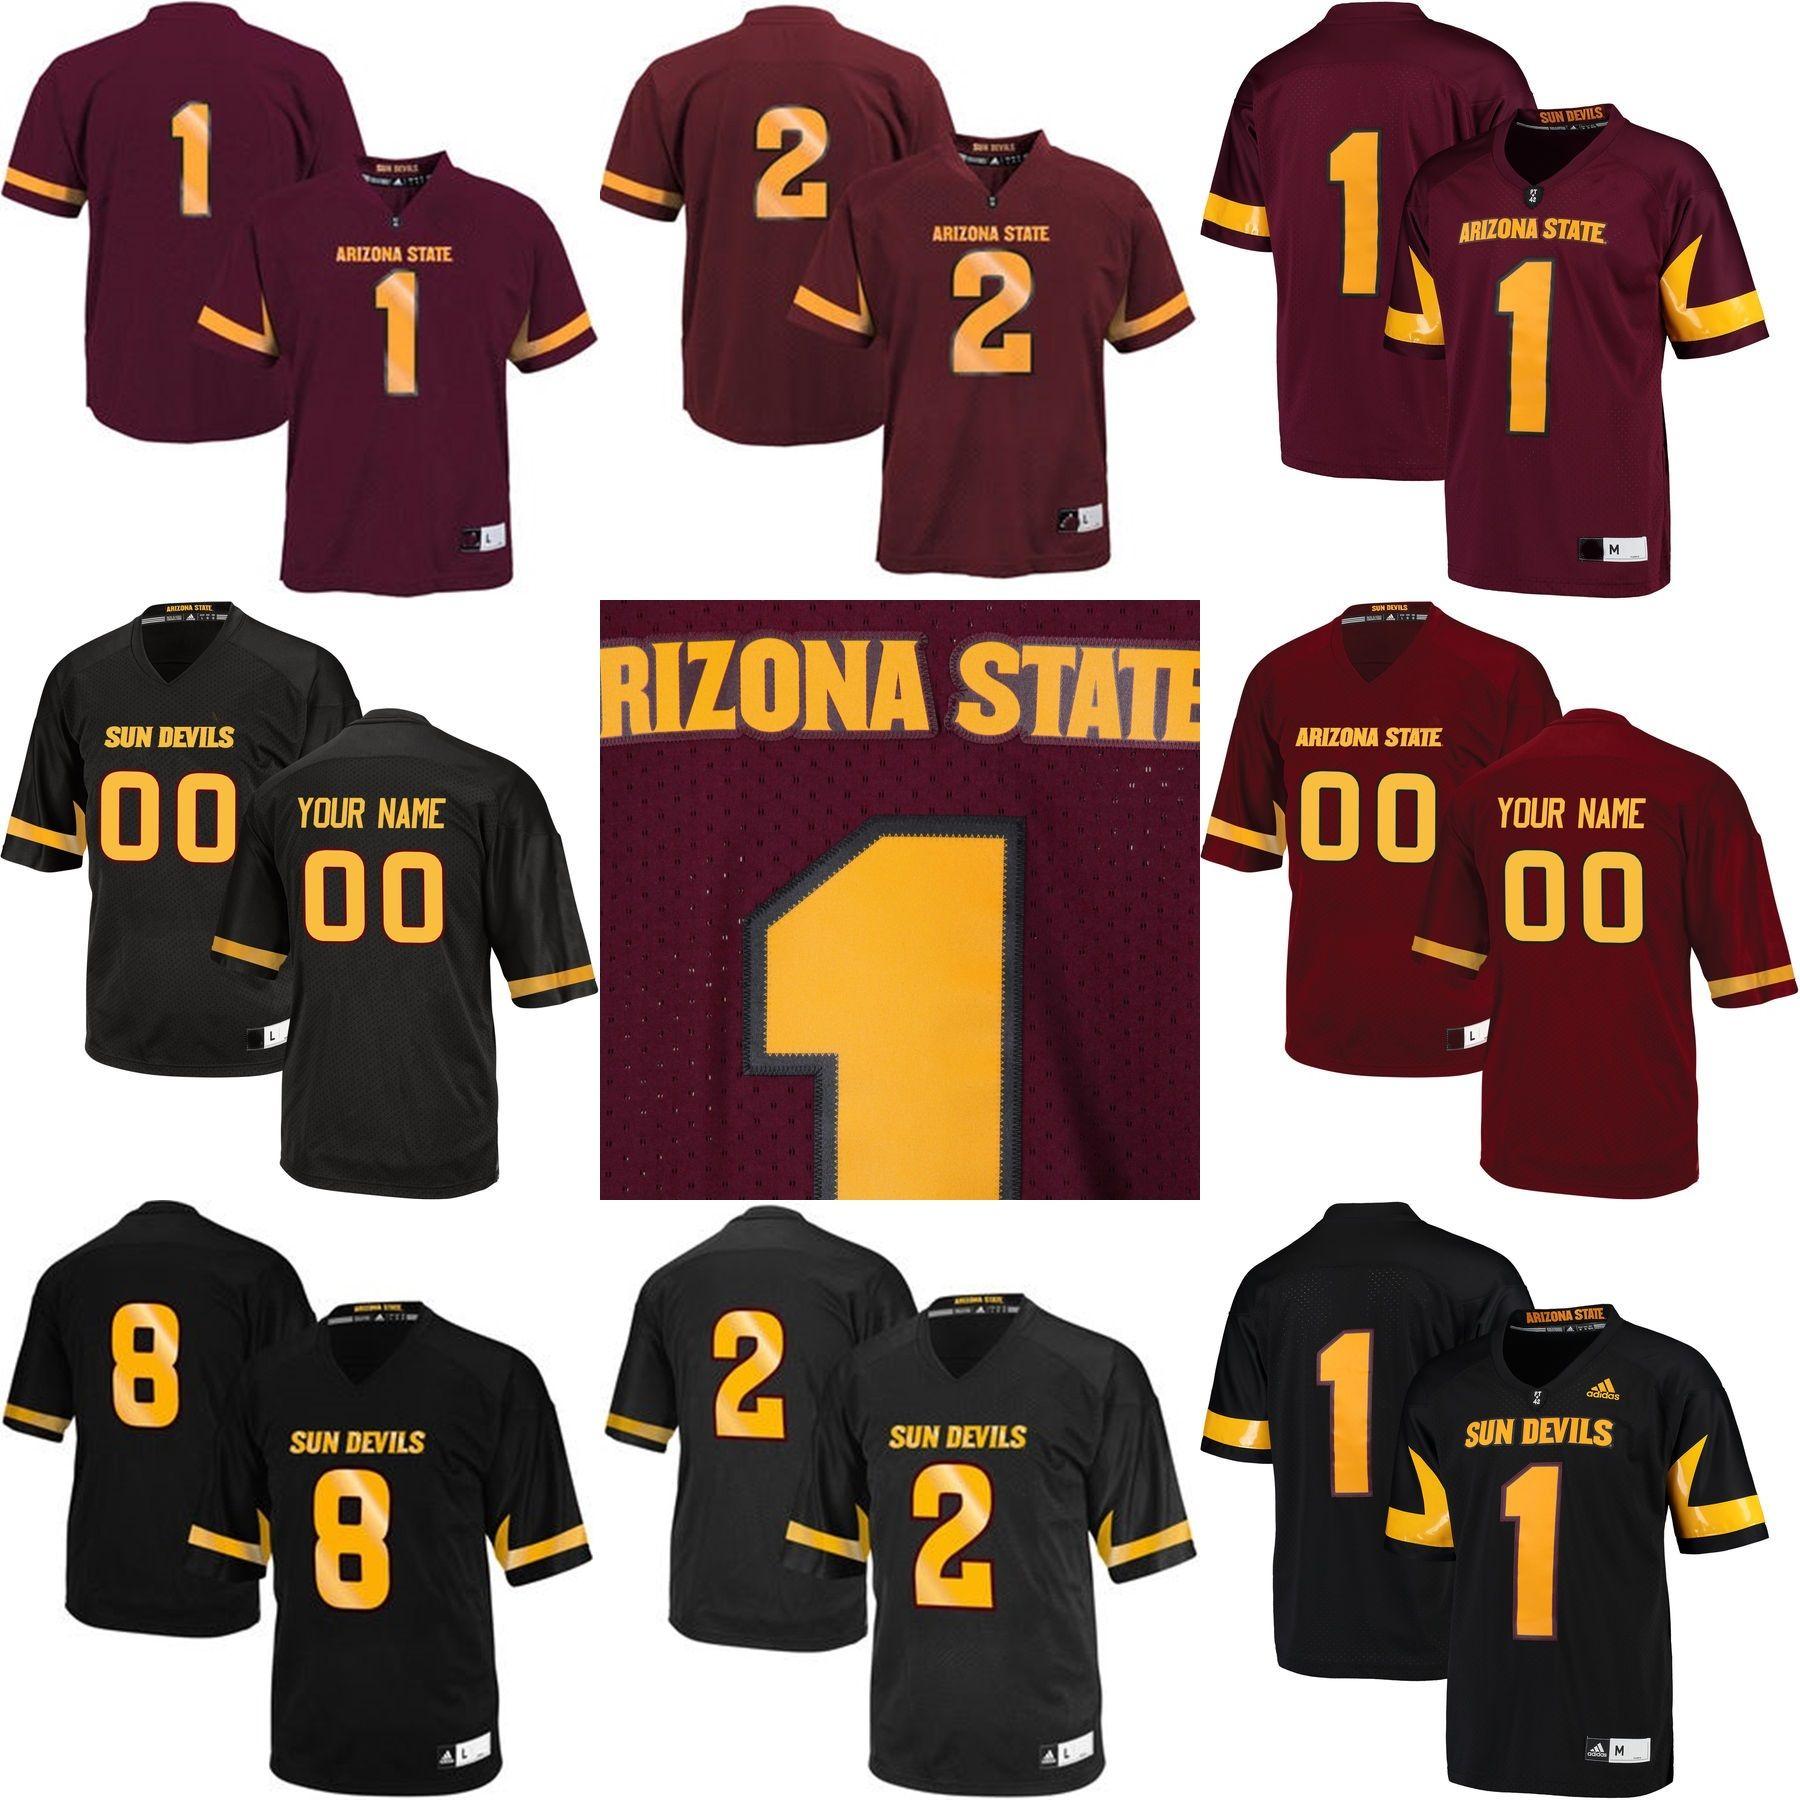 Hot Sale Customize NCAA Arizona State Sun Devils Jersey Mens Womens ... 3c928a6bc